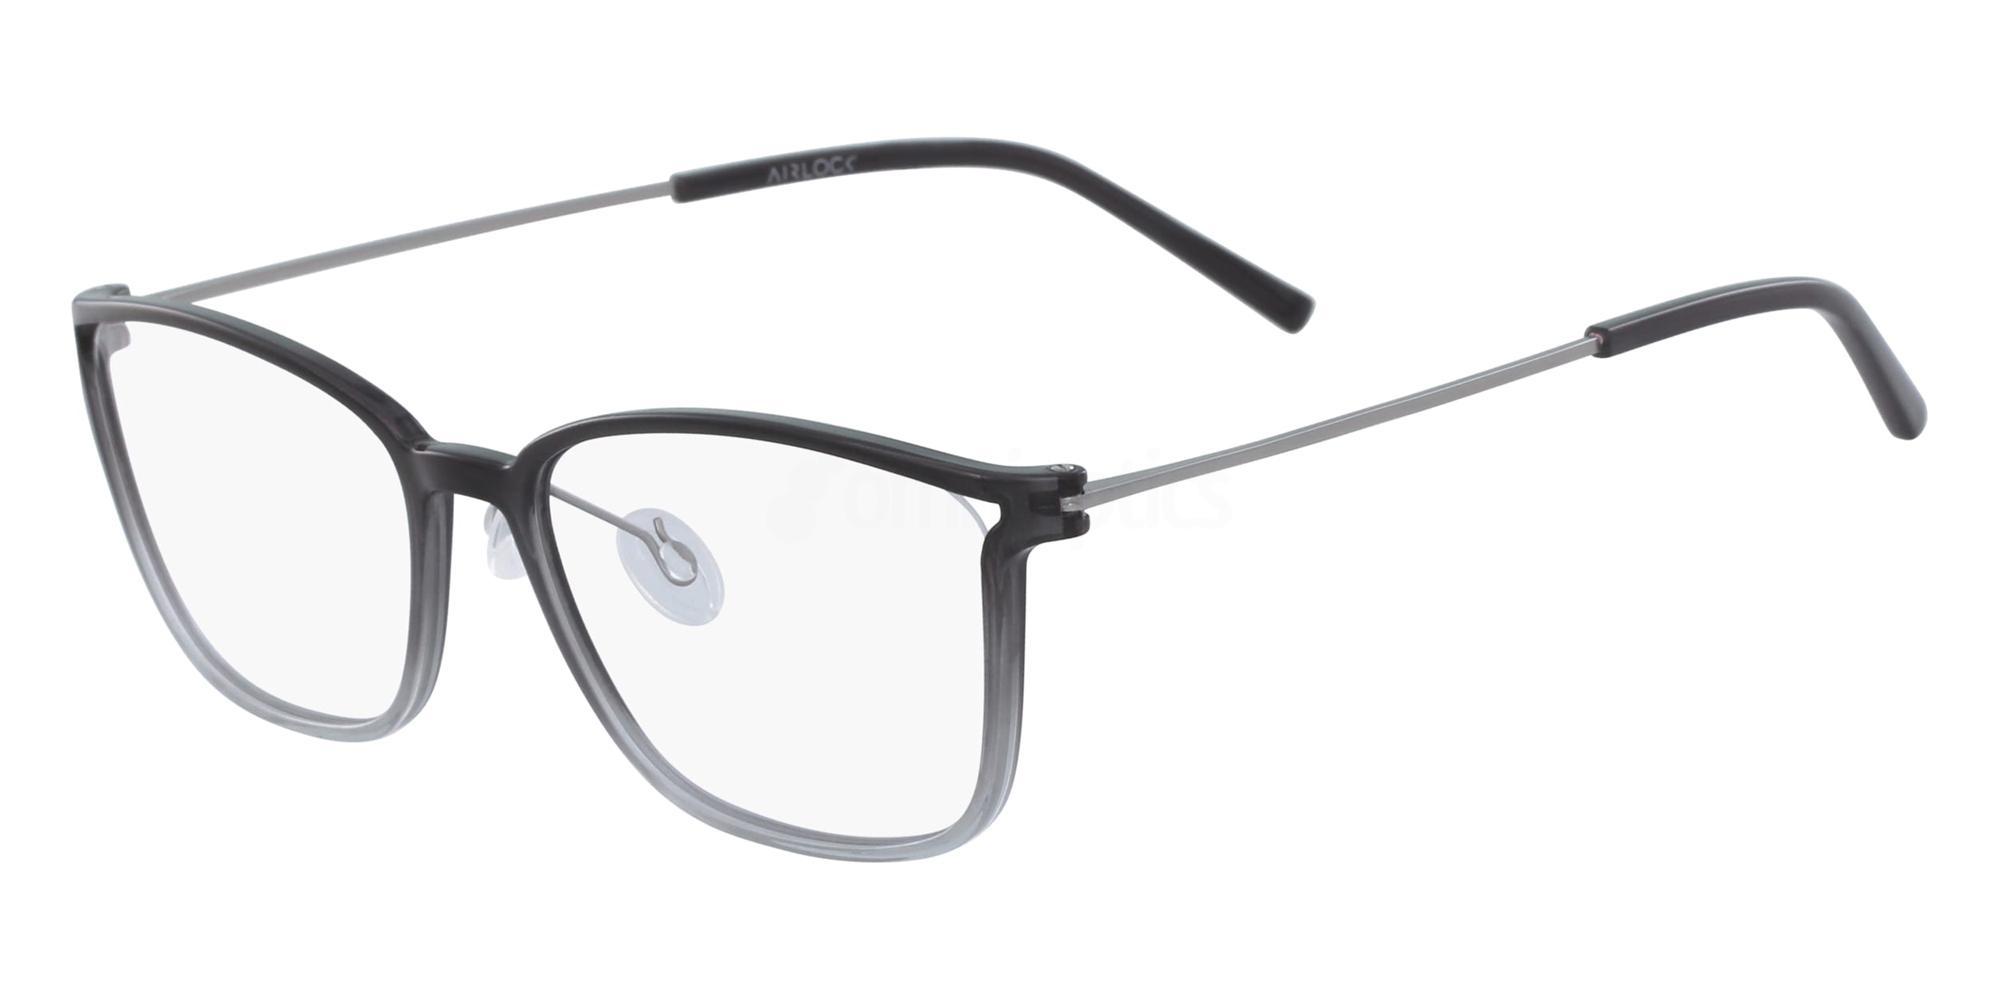 001 AIRLOCK 3001 Glasses, Pure